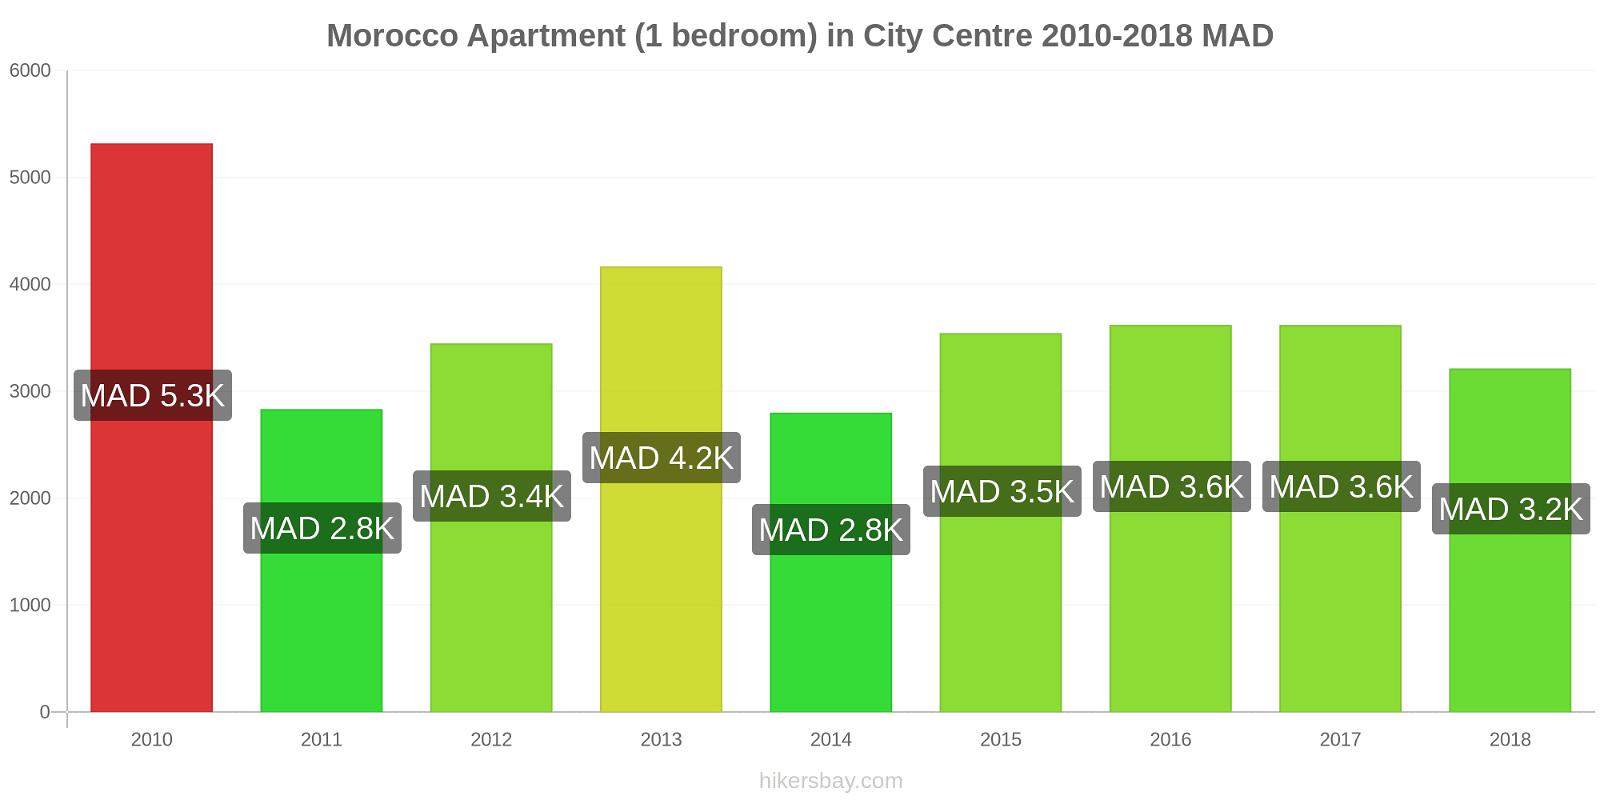 Morocco price changes Apartment (1 bedroom) in City Centre hikersbay.com